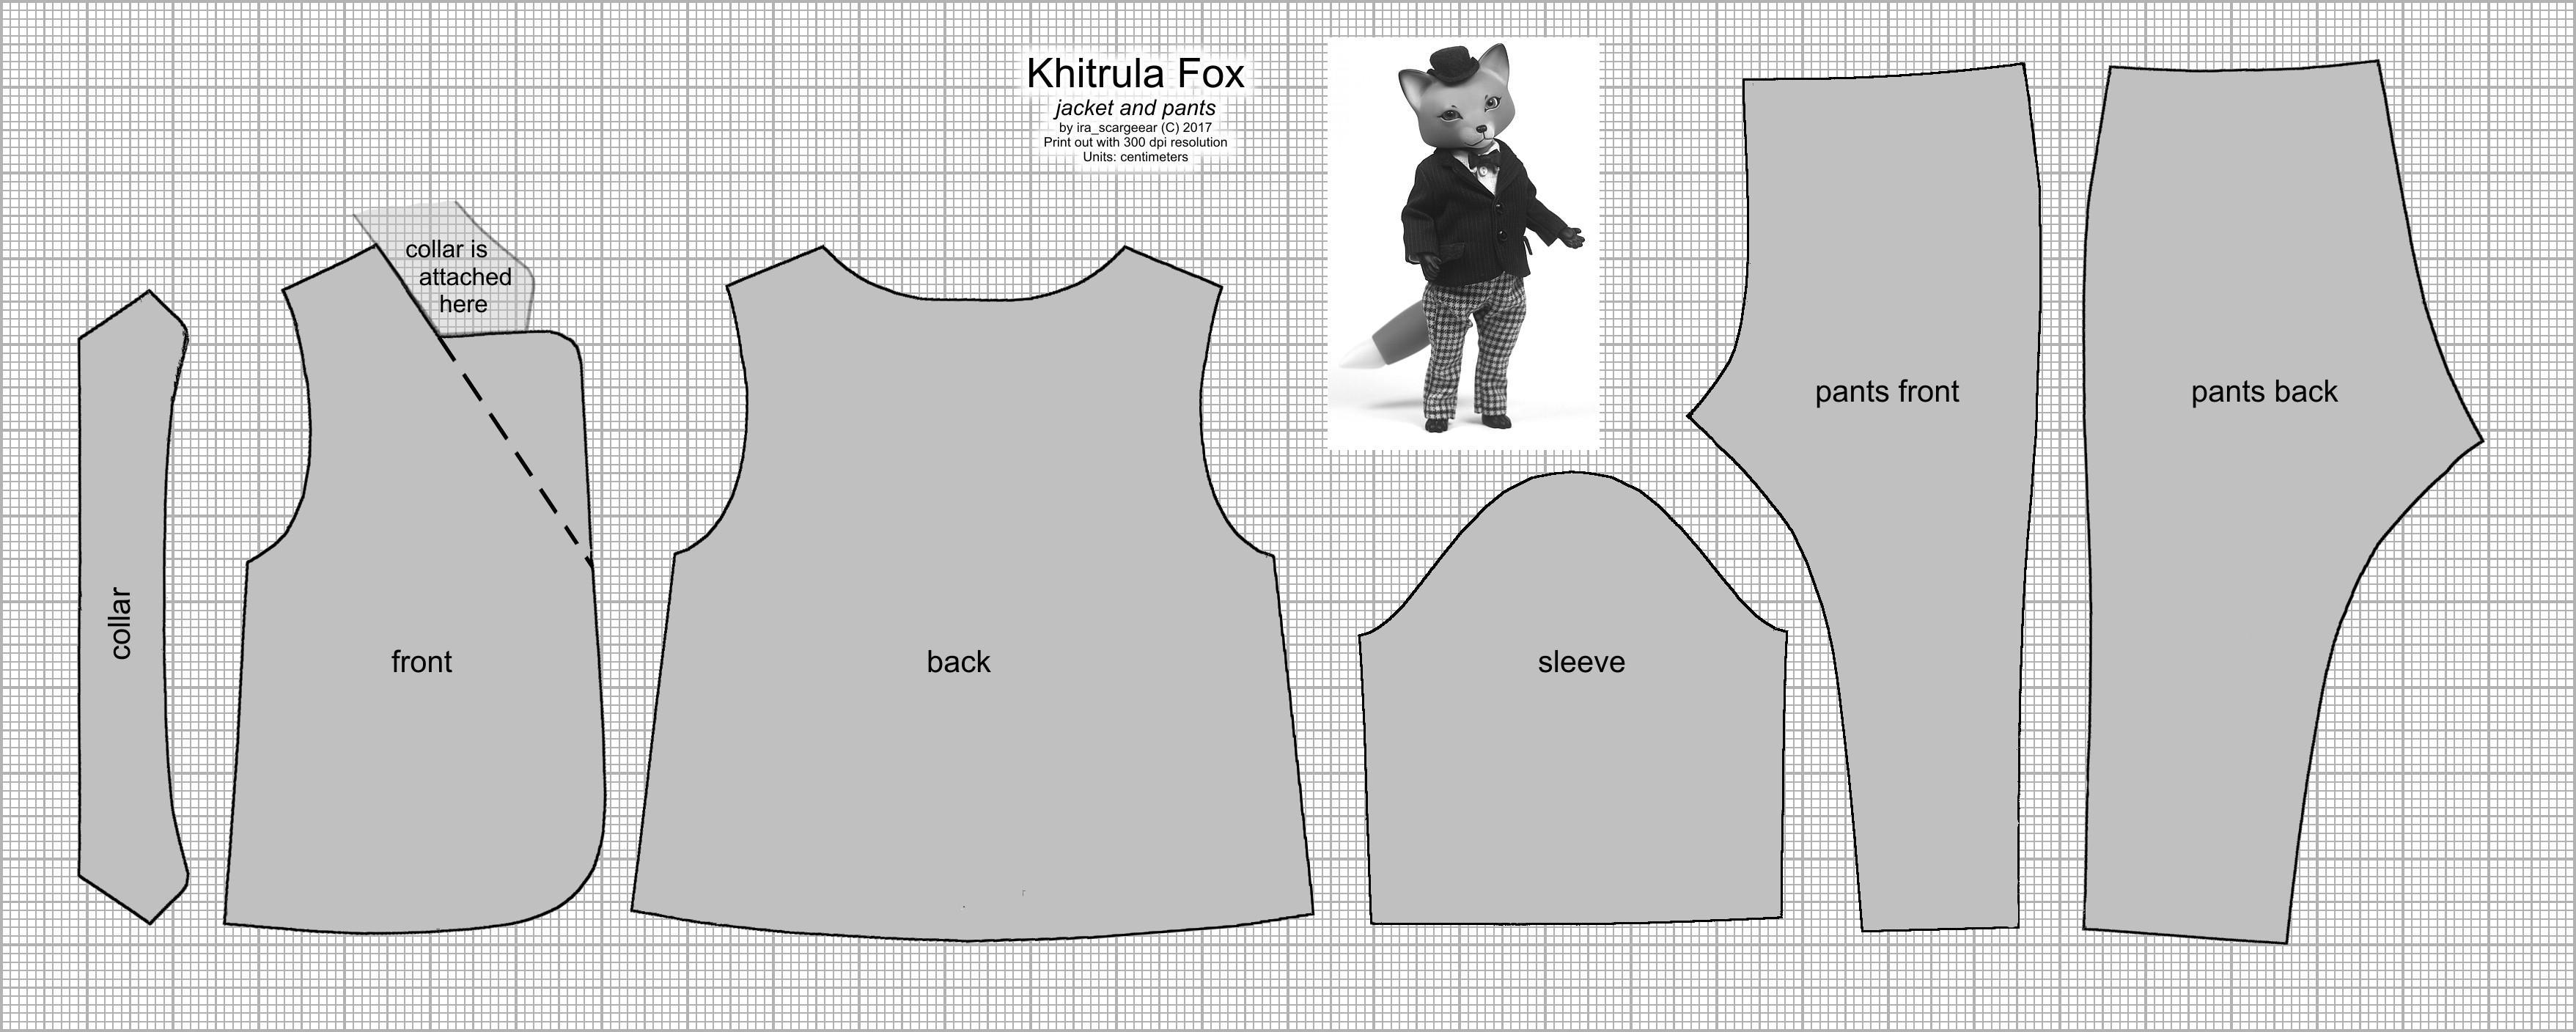 Khitrula Fox Jacket and Pants Pattern by scargeear